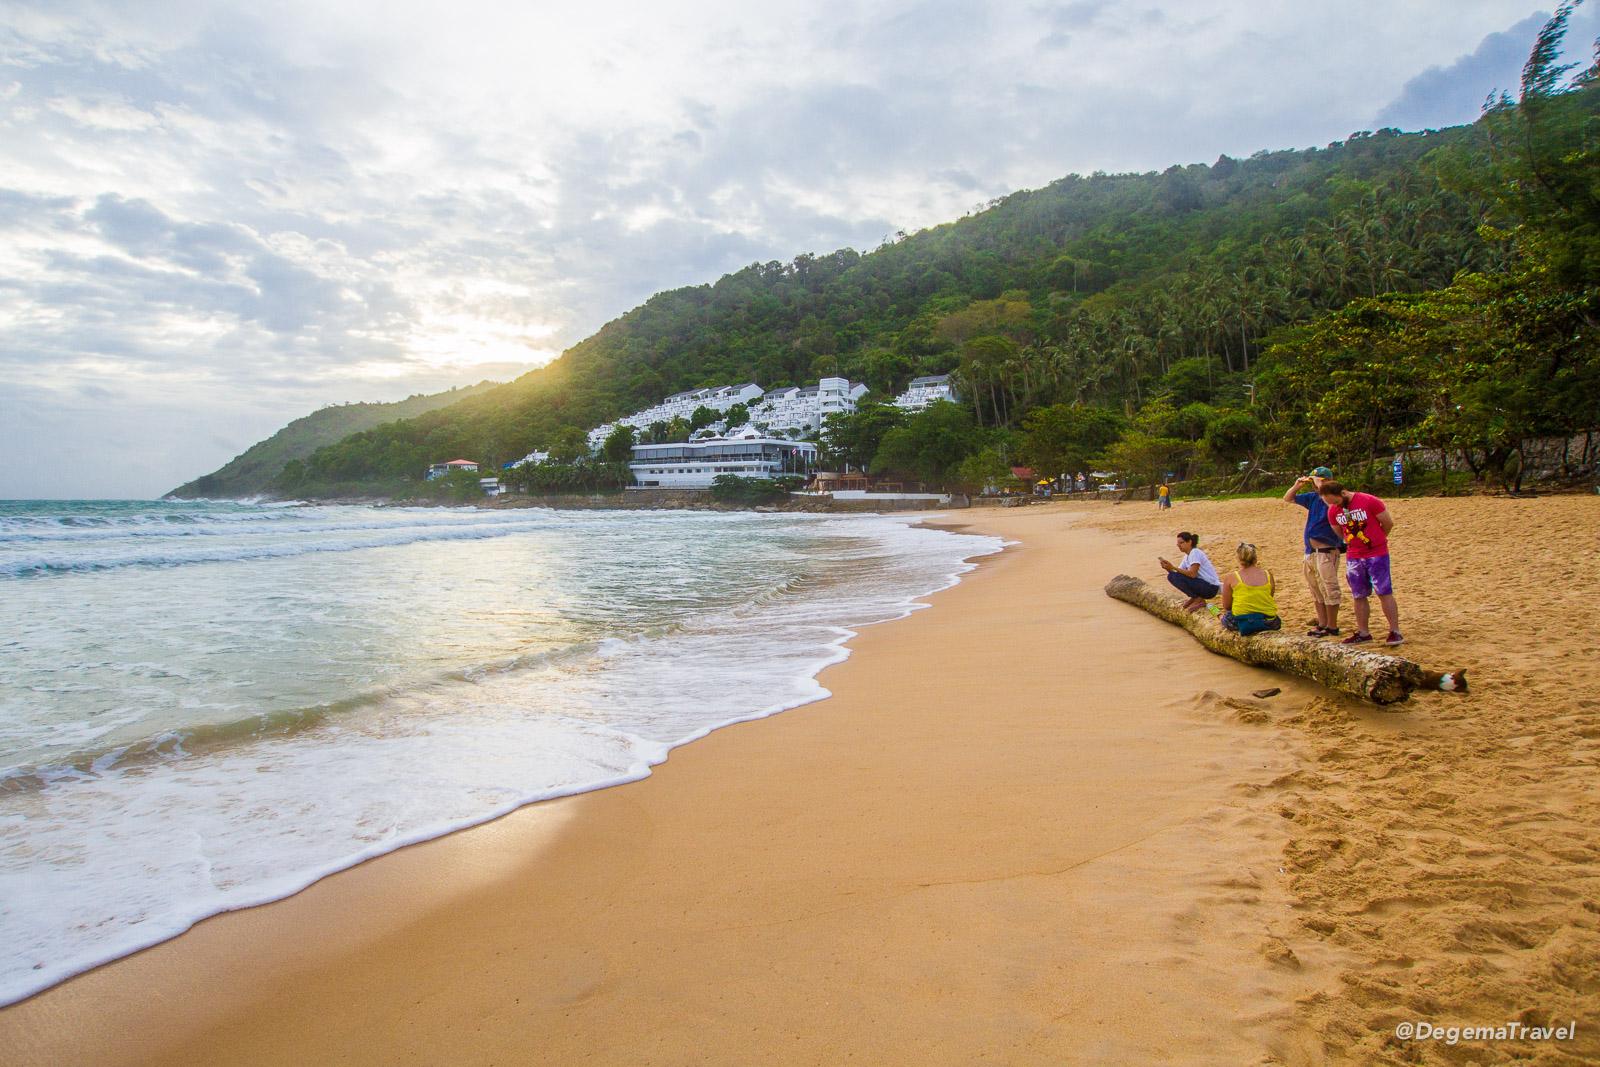 Nai Harn Beach in Phuket, Thailand